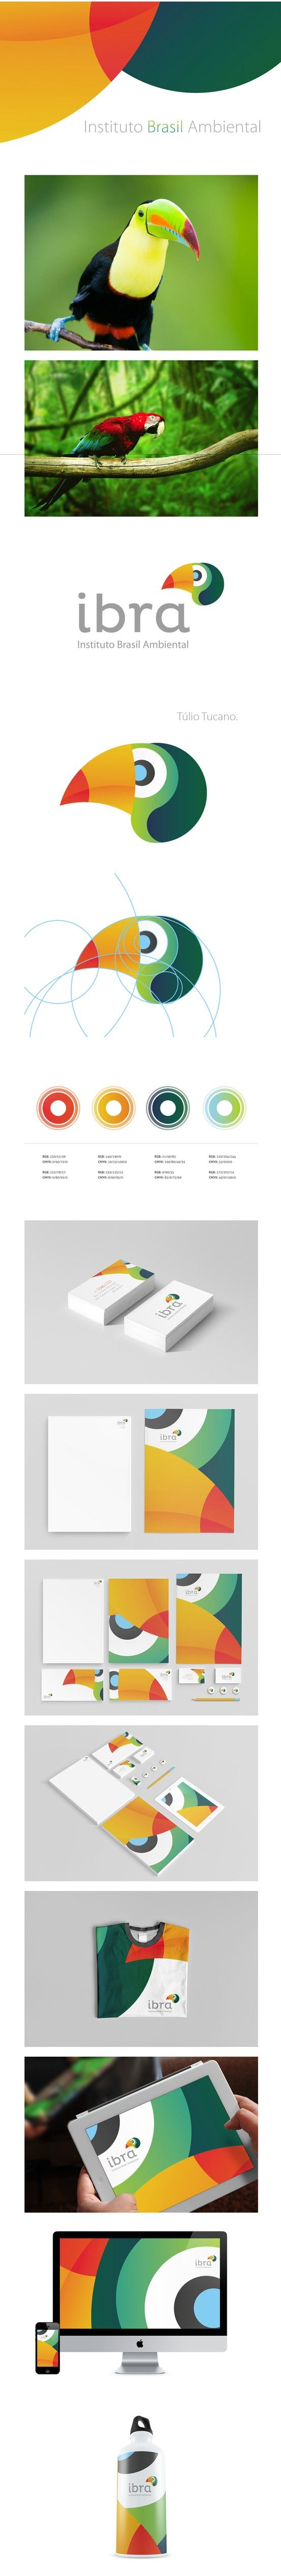 IBRA brand and identity elements